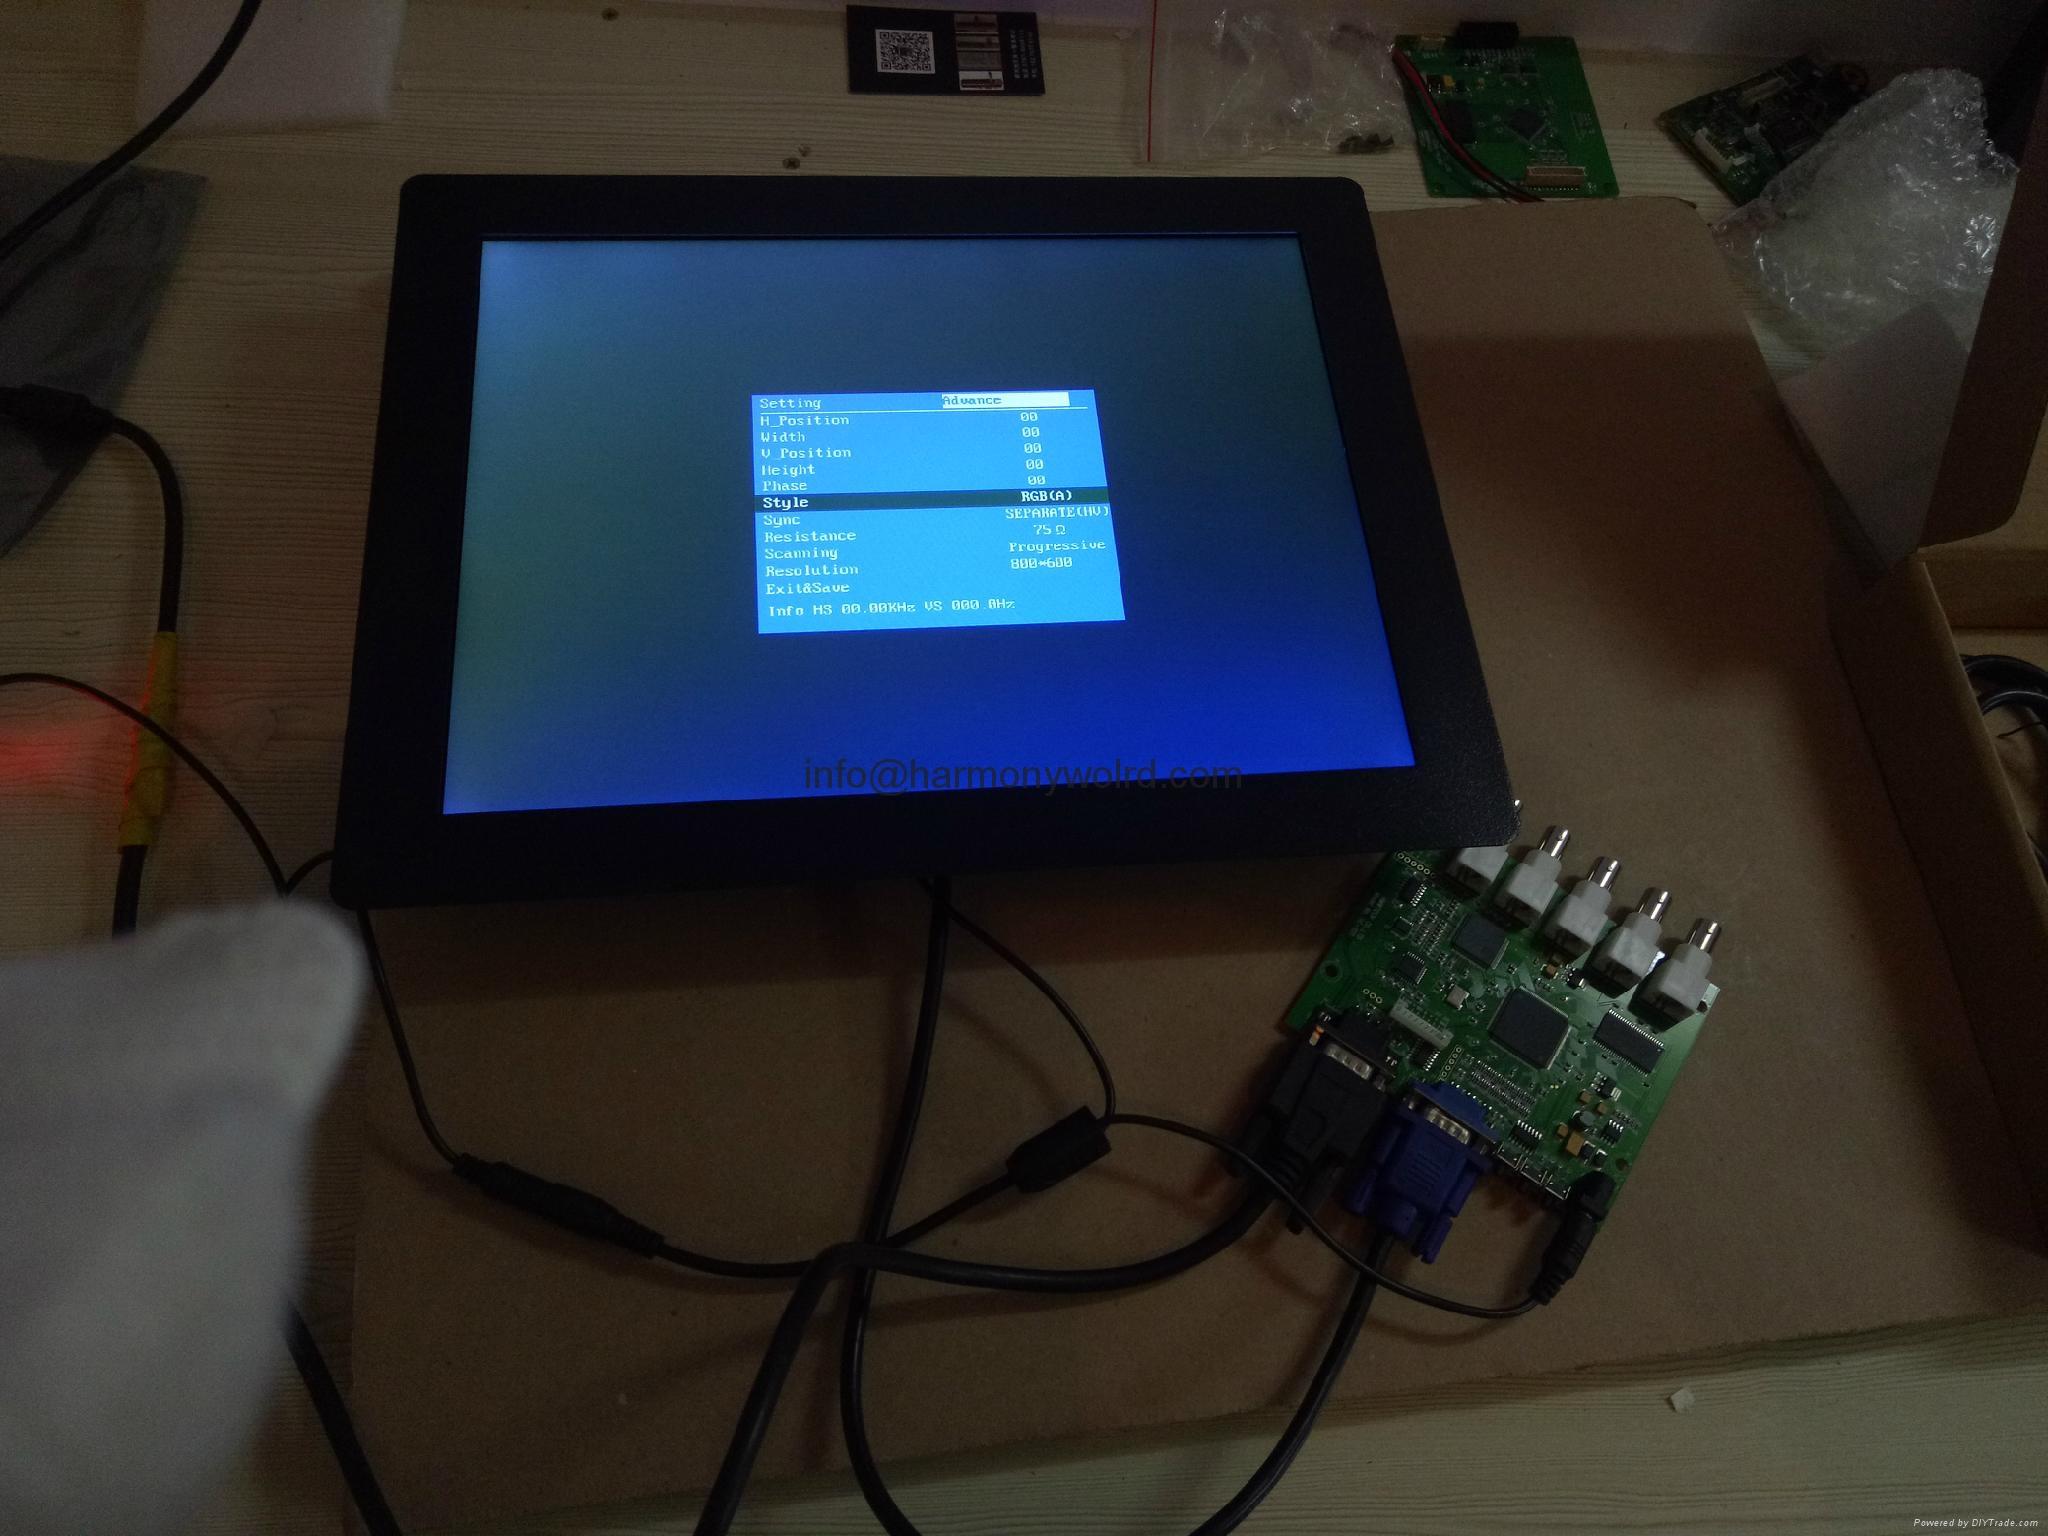 Upgrade Microvitec Monitor MV15LCDL-CHA MV15LCDL-RM 15VD4DLS2 15VD48DLS2 To LCDs 3